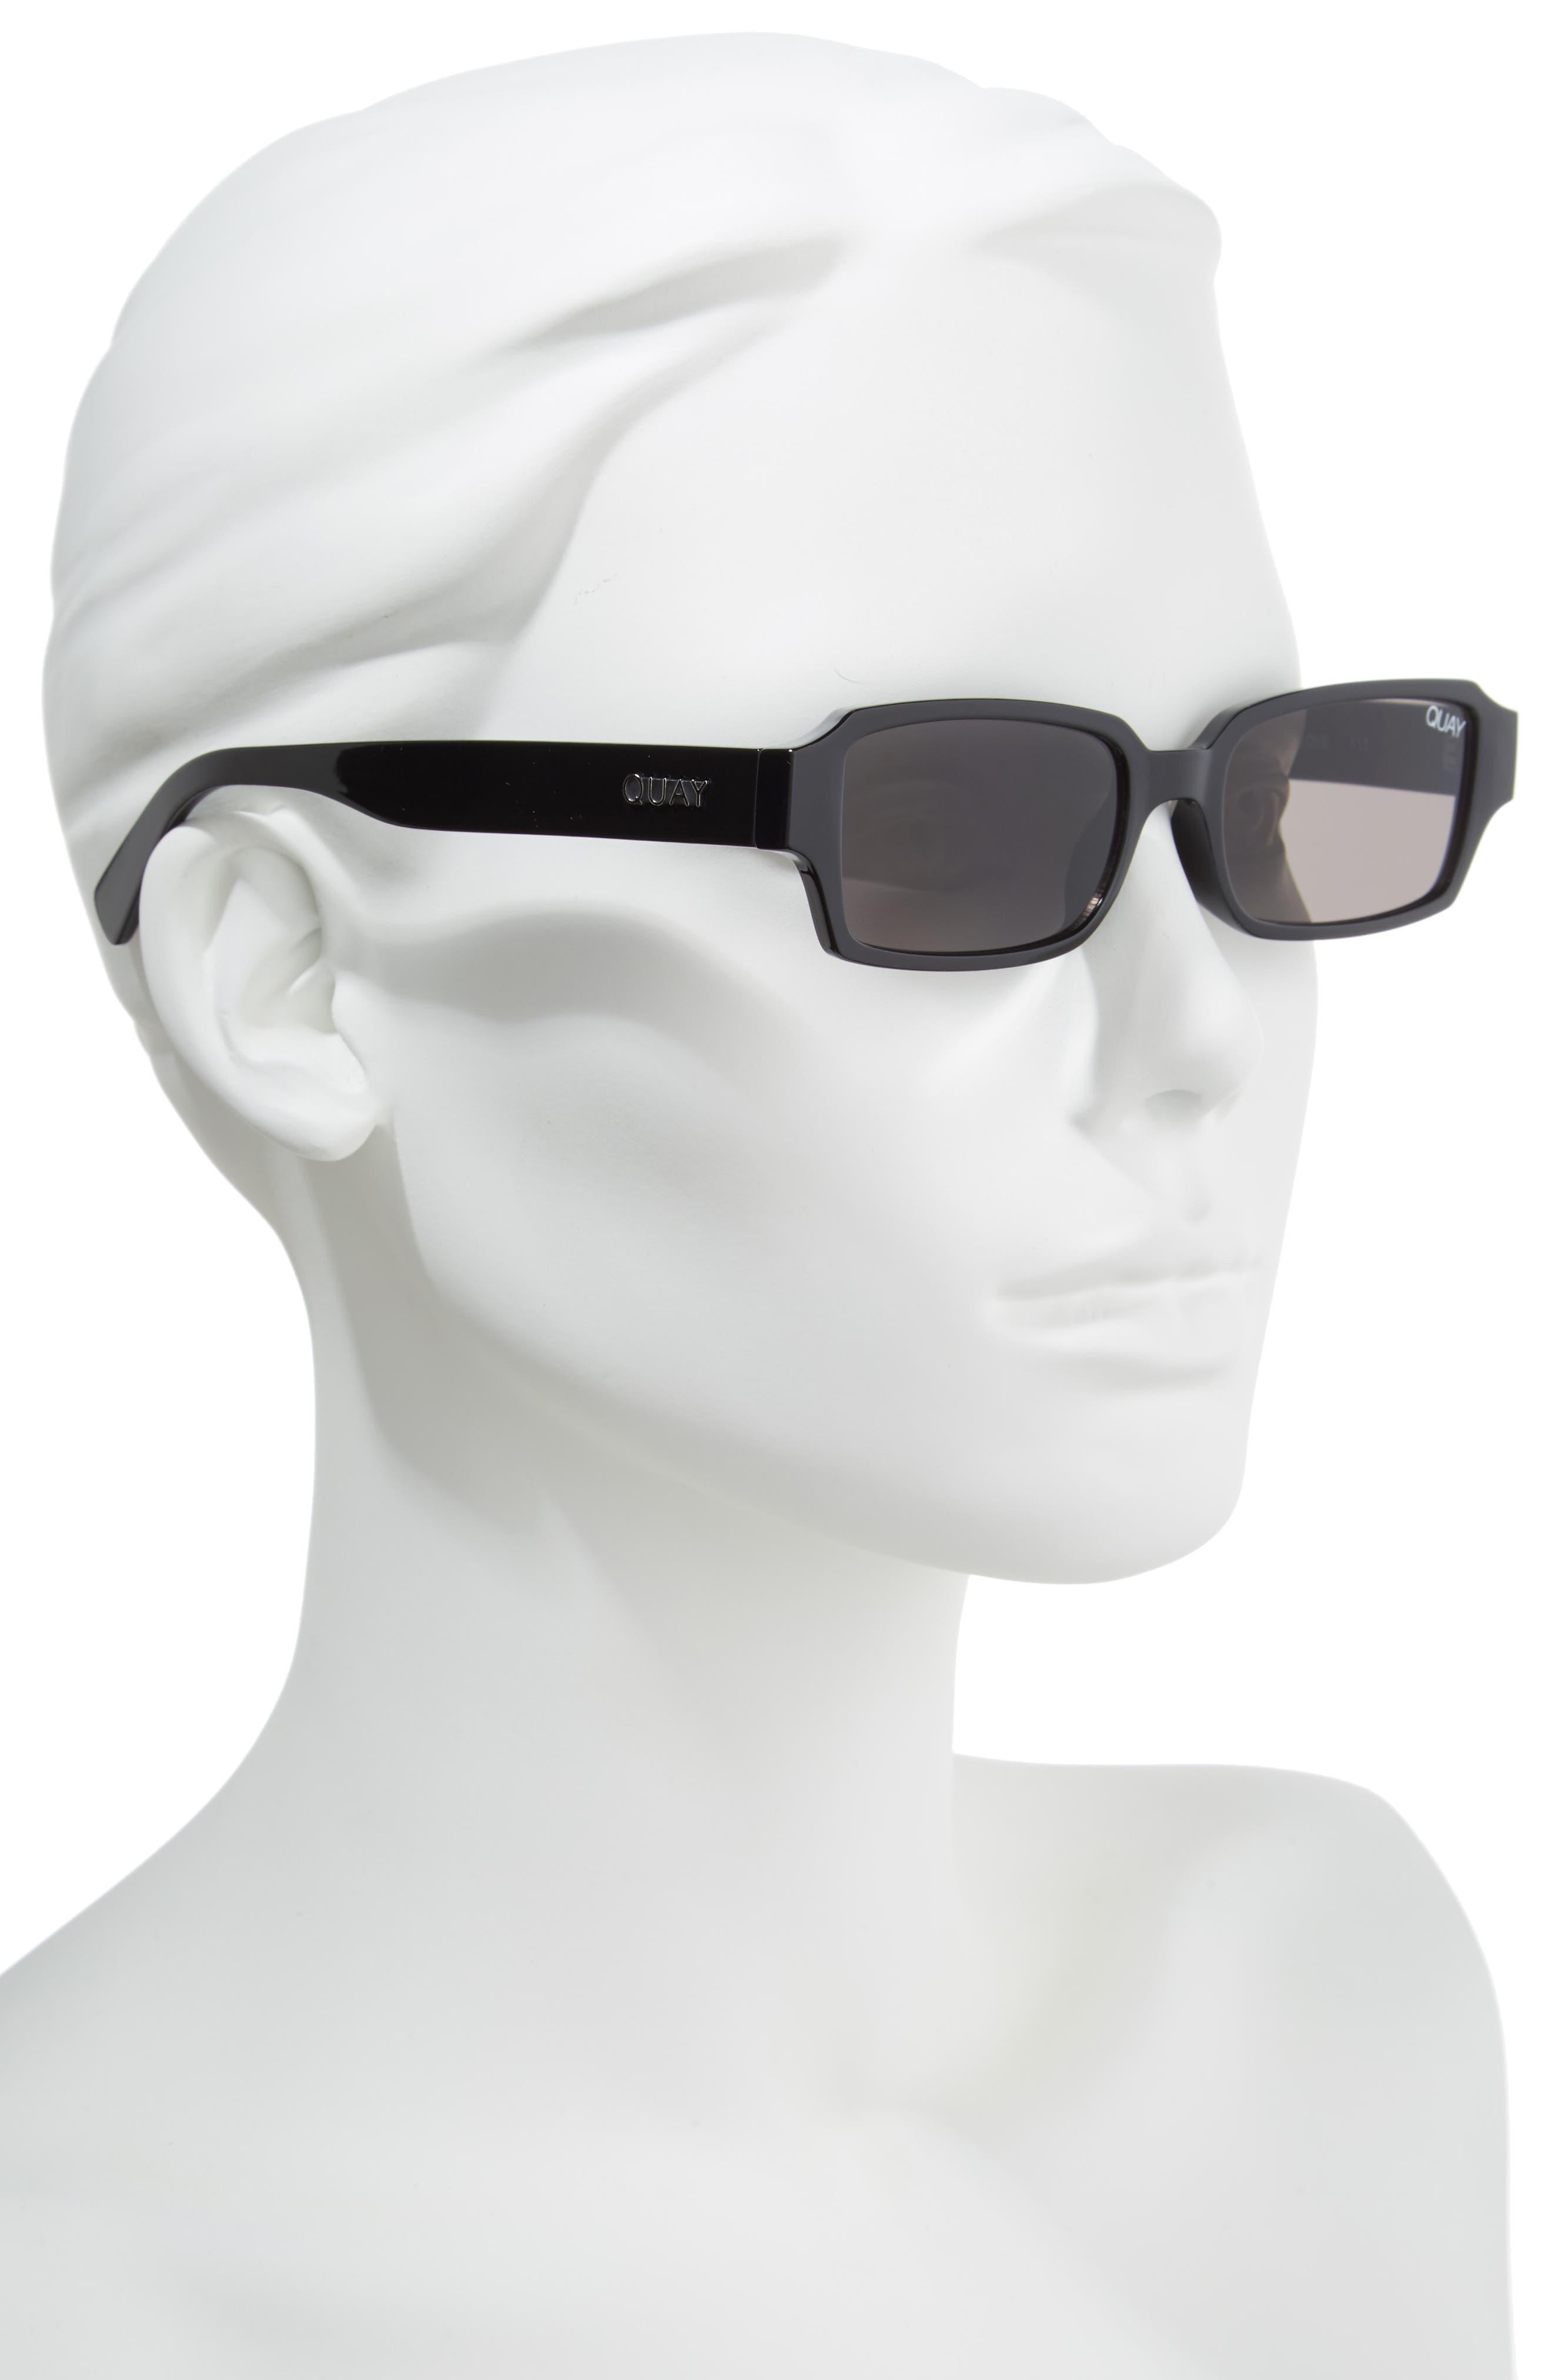 Strange Love 53mm Rectangle Sunglasses,                             Alternate thumbnail 2, color,                             BLACK/ SMOKE